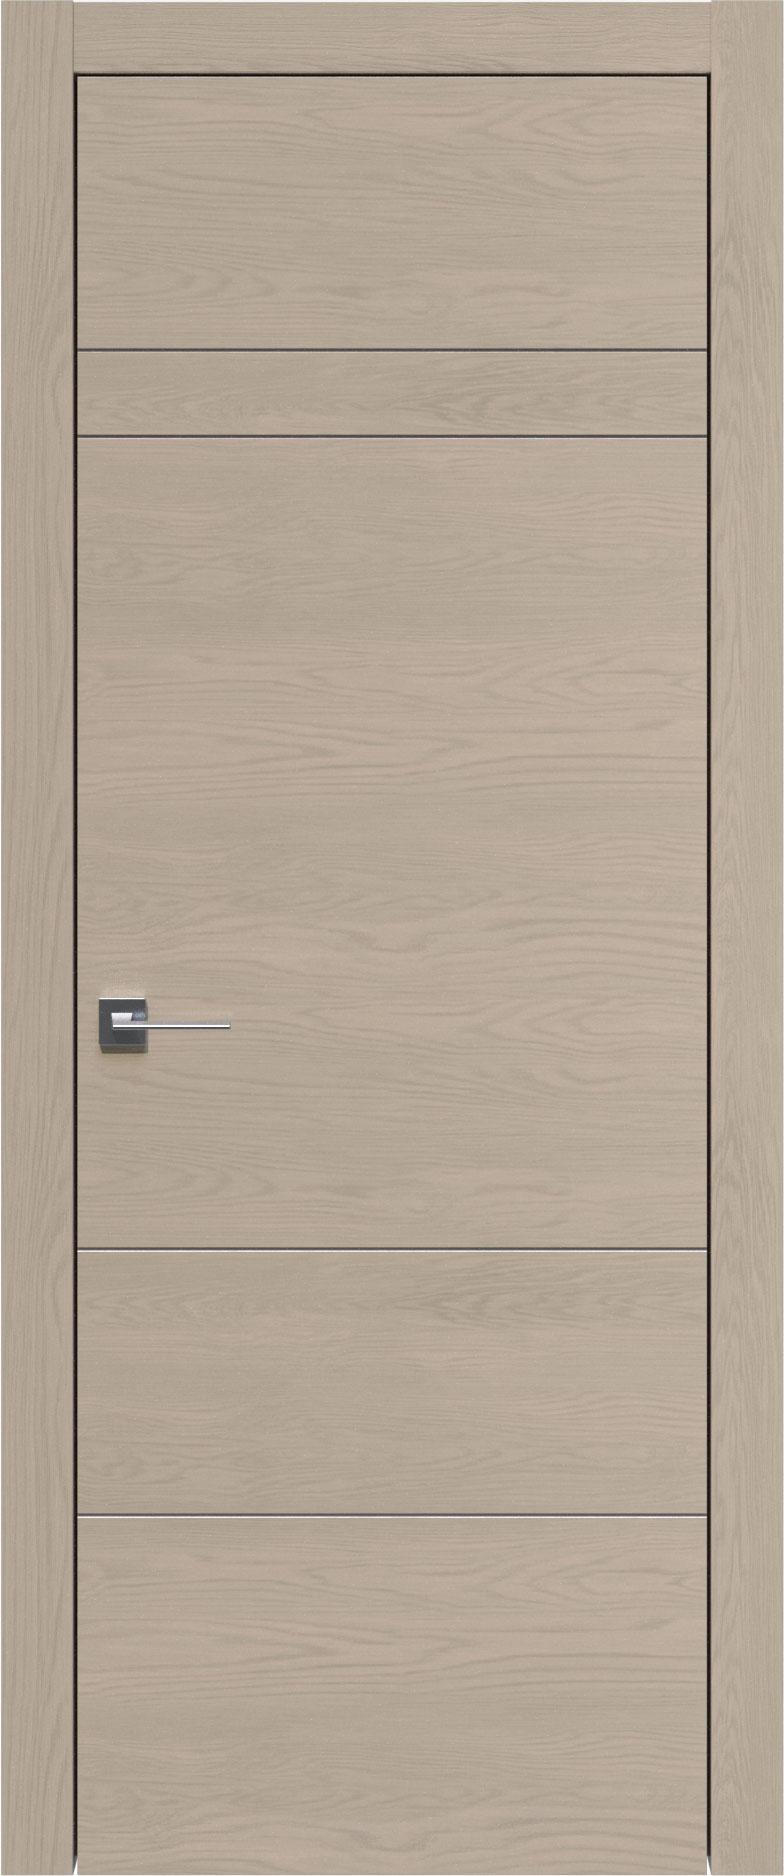 Tivoli К-2 цвет - Дуб муар Без стекла (ДГ)